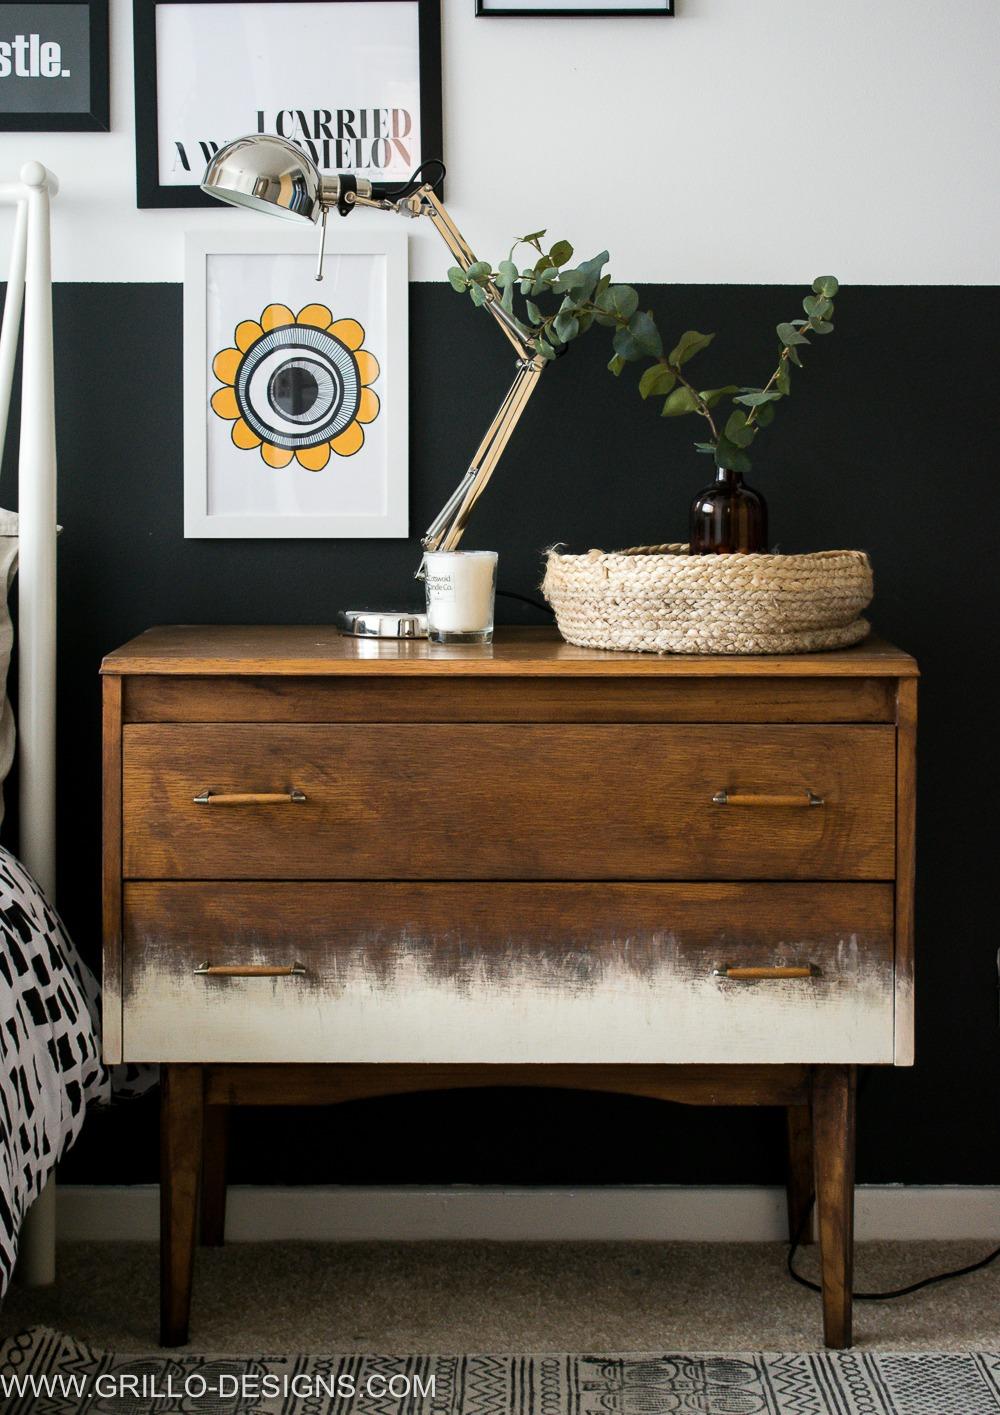 Modern style mid century dresser makeover/ Grillo Designs www.grillo-designs.com